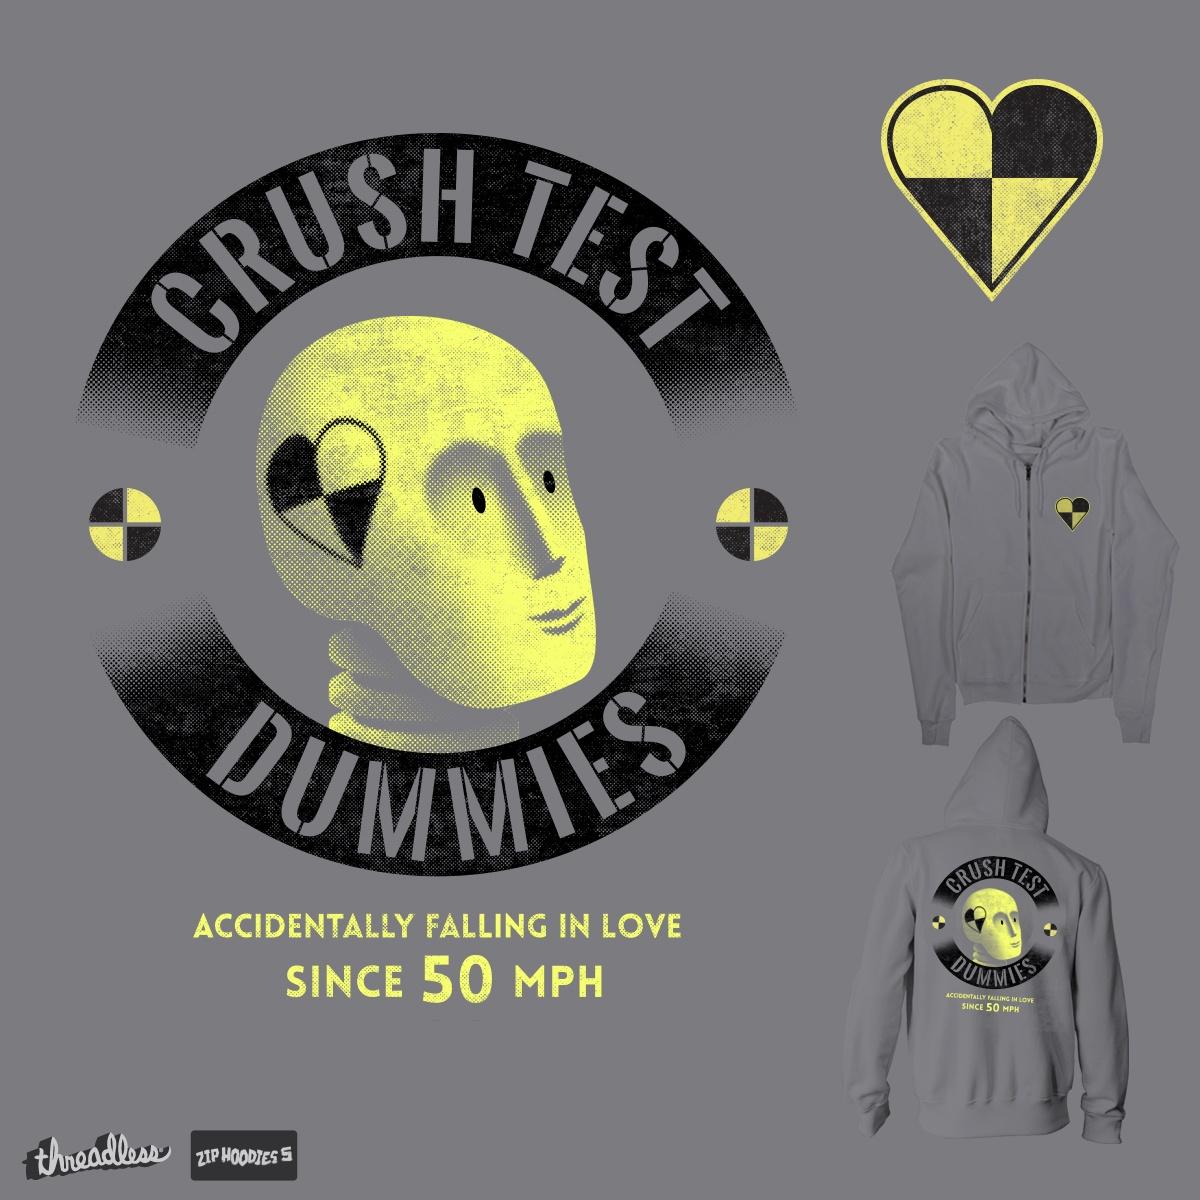 Crush Test Dummies by biernatt on Threadless